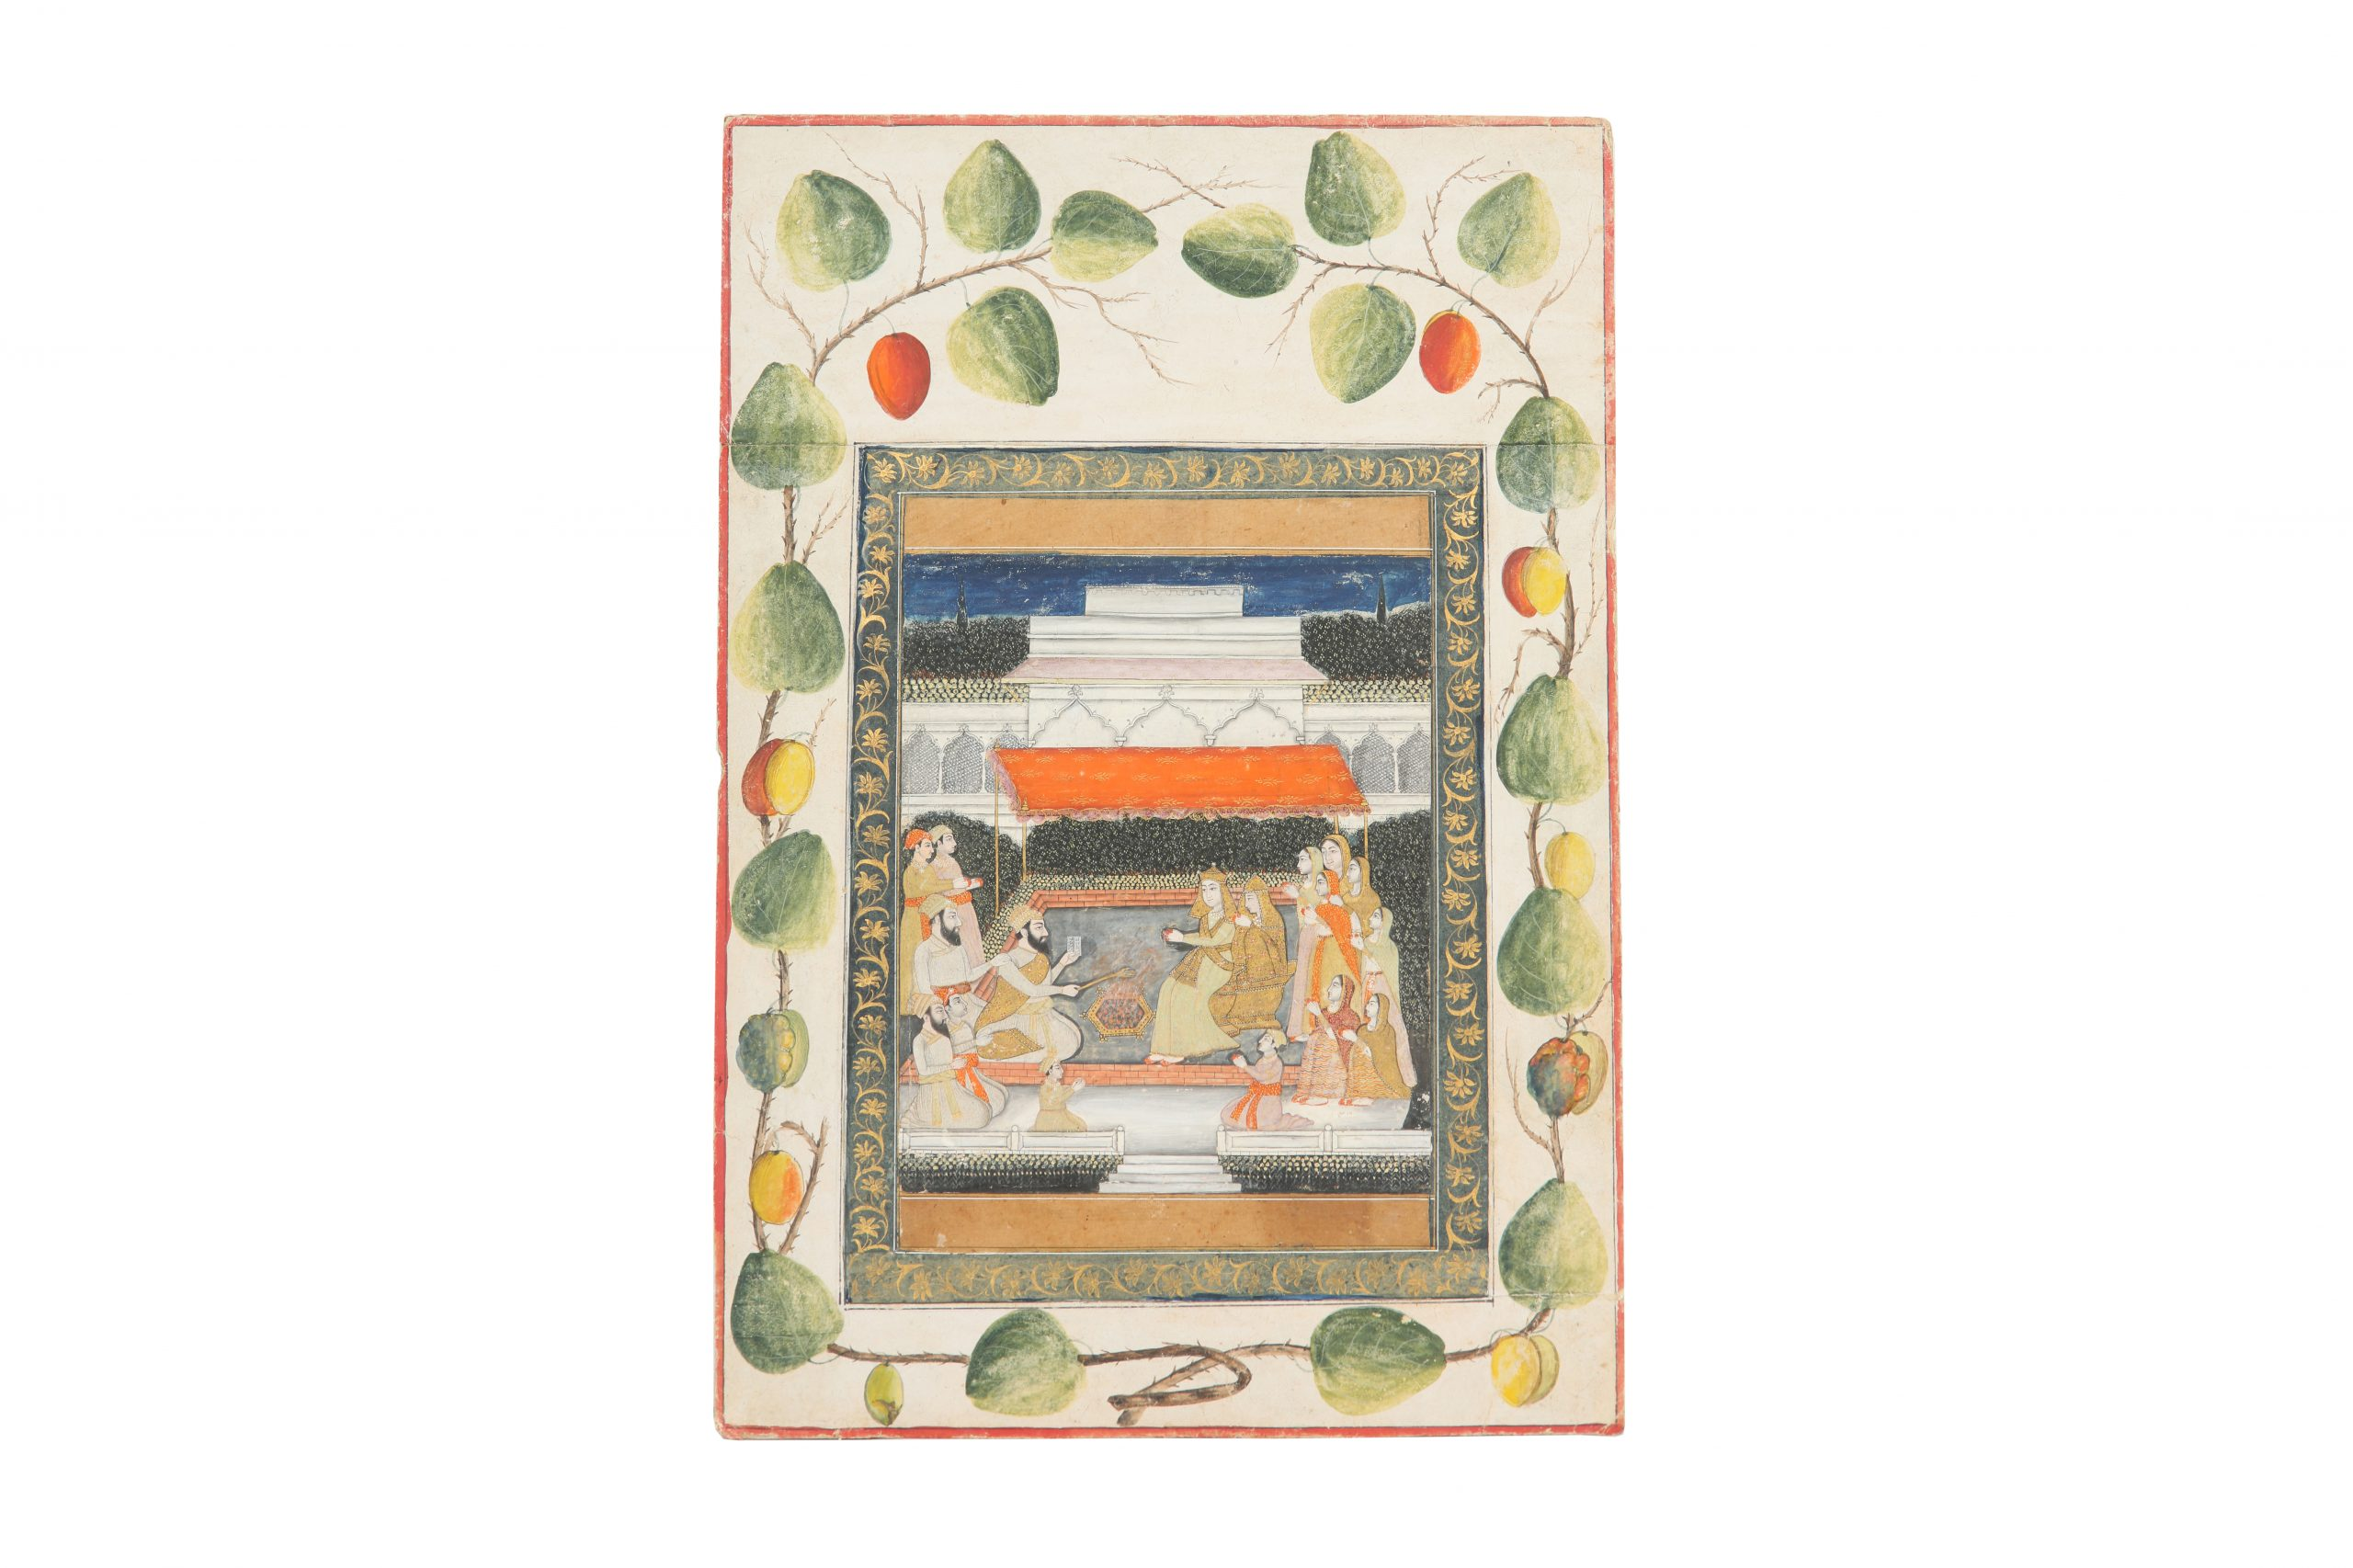 A ruler performing Yajna (fire ritual). Provincial Mughal, Delhi or Hyderabad school, India, 19th century. Estimate £800 - £1,200